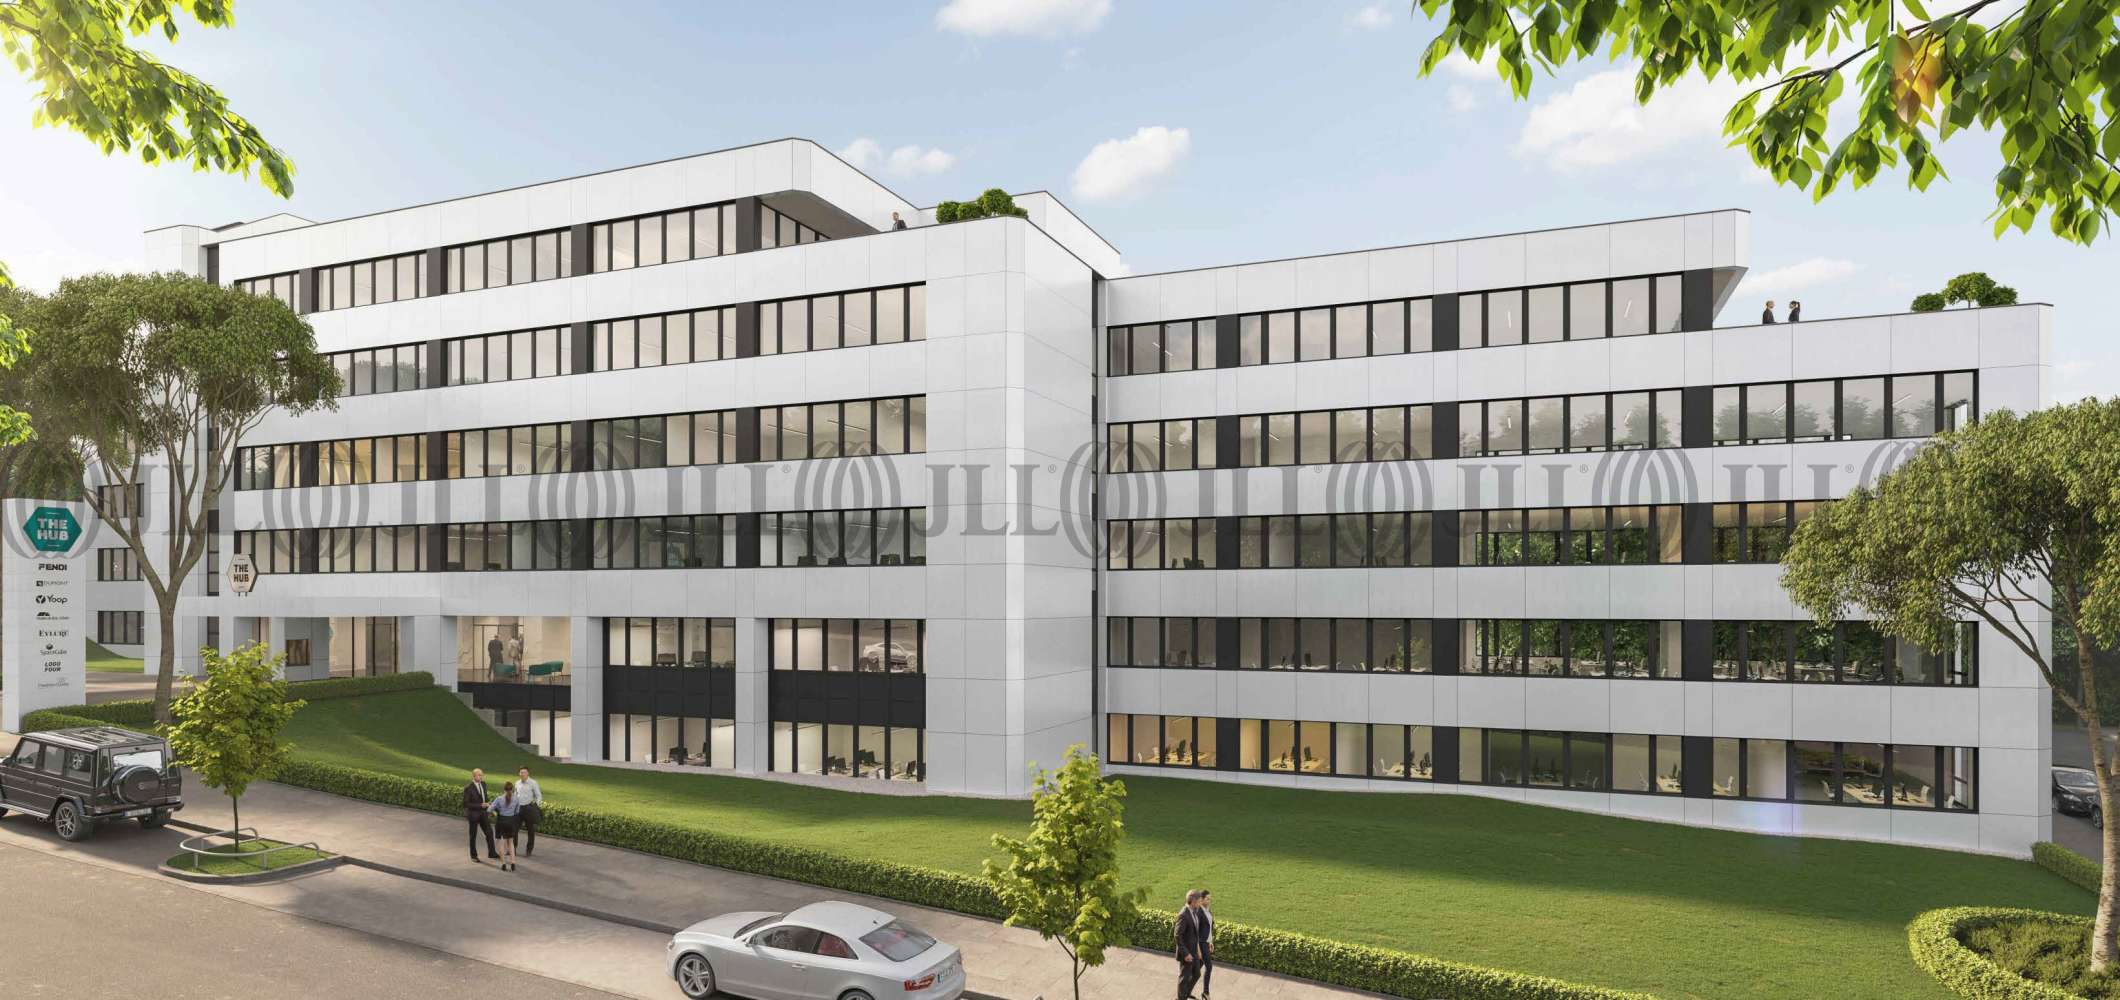 Büros Frankfurt am main, 60437 - Büro - Frankfurt am Main, Nieder-Eschbach - F2584 - 10534020